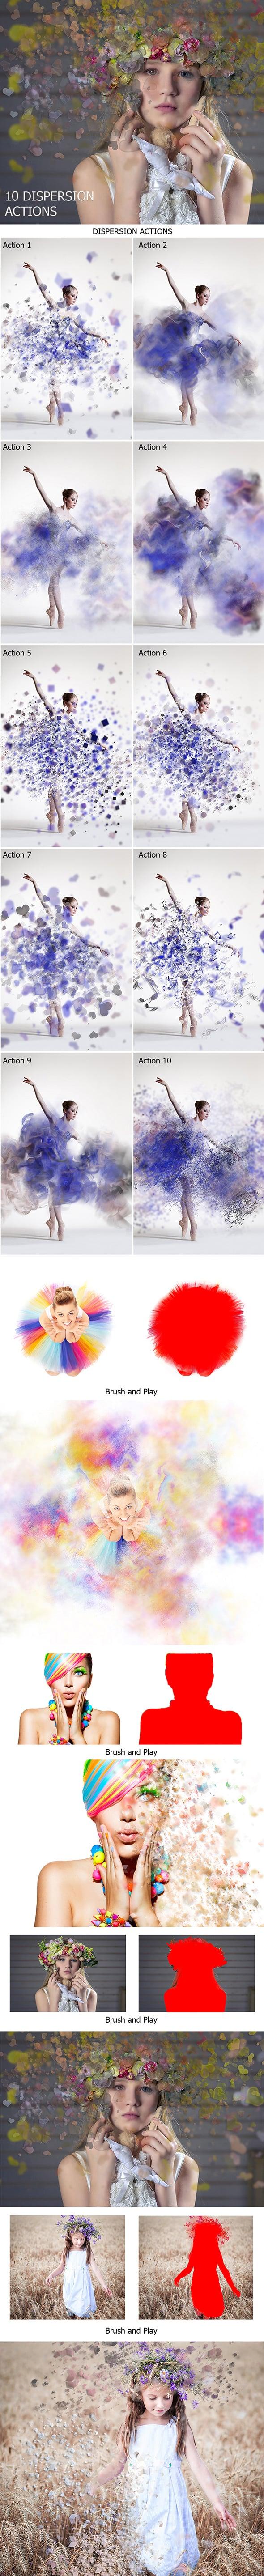 63 VSCO Photoshop Actions: Artistic Actions Bundle - just $9 - 13